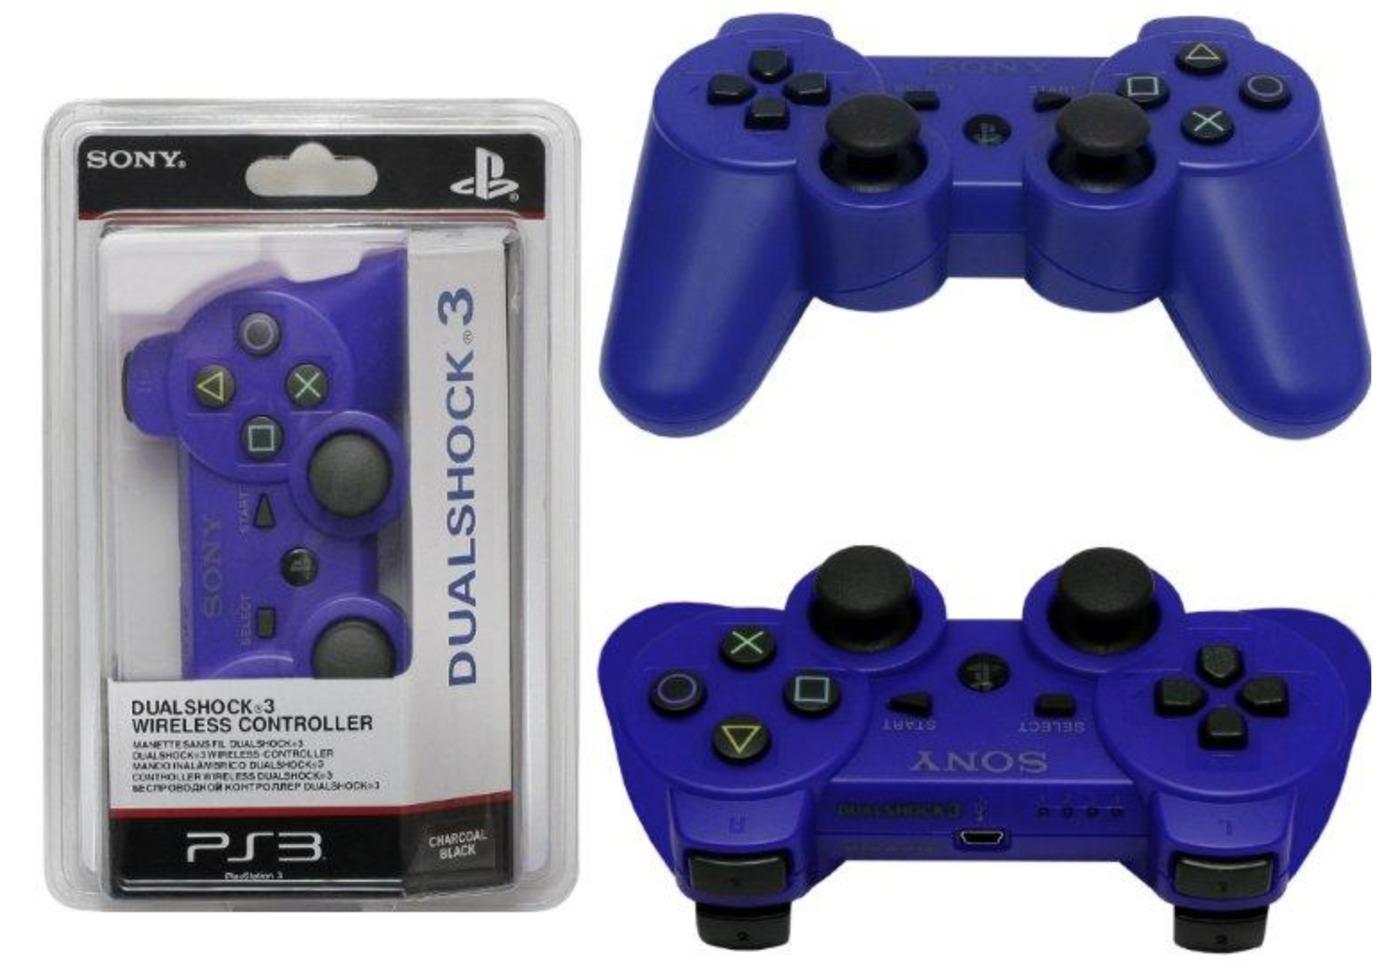 Джойстик Sony DualShock 3 для PS3 синий